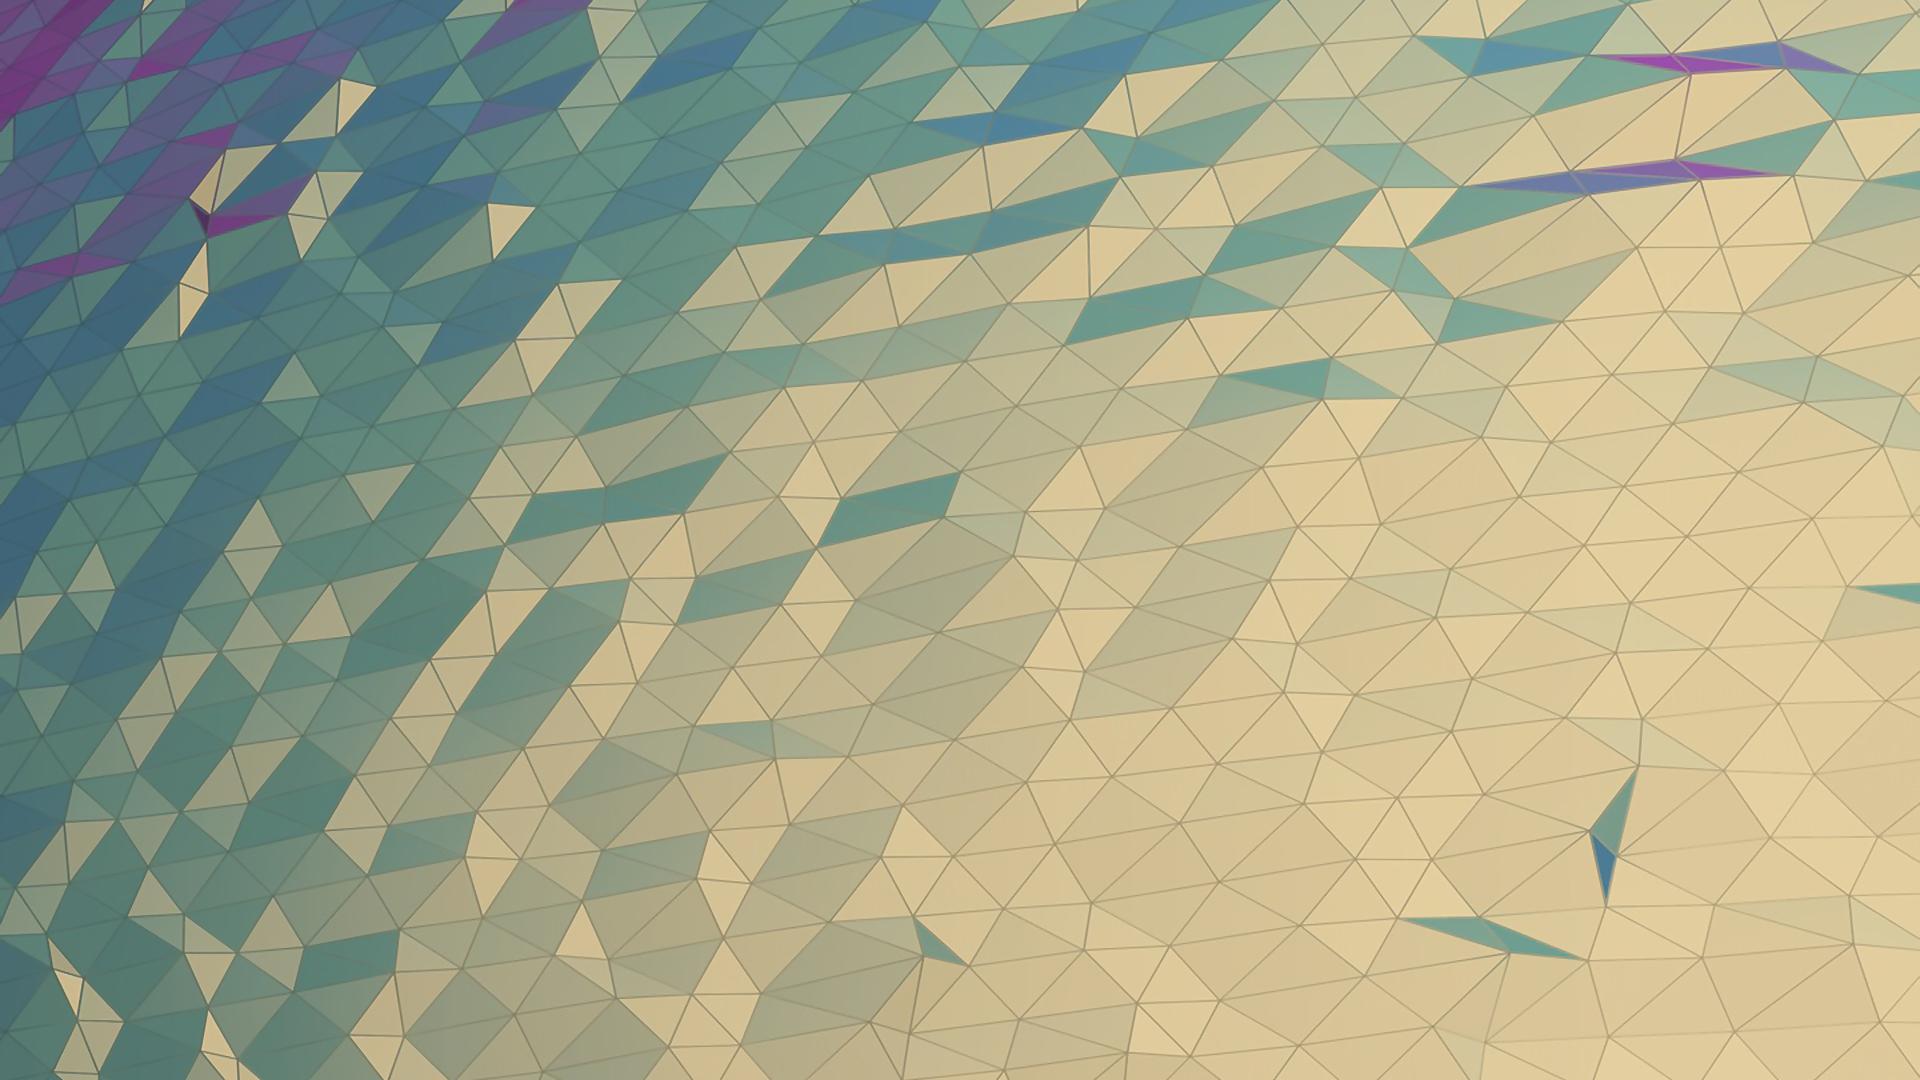 blogspotcom201207abstract hd jelly bean geometrichtml 1920x1080